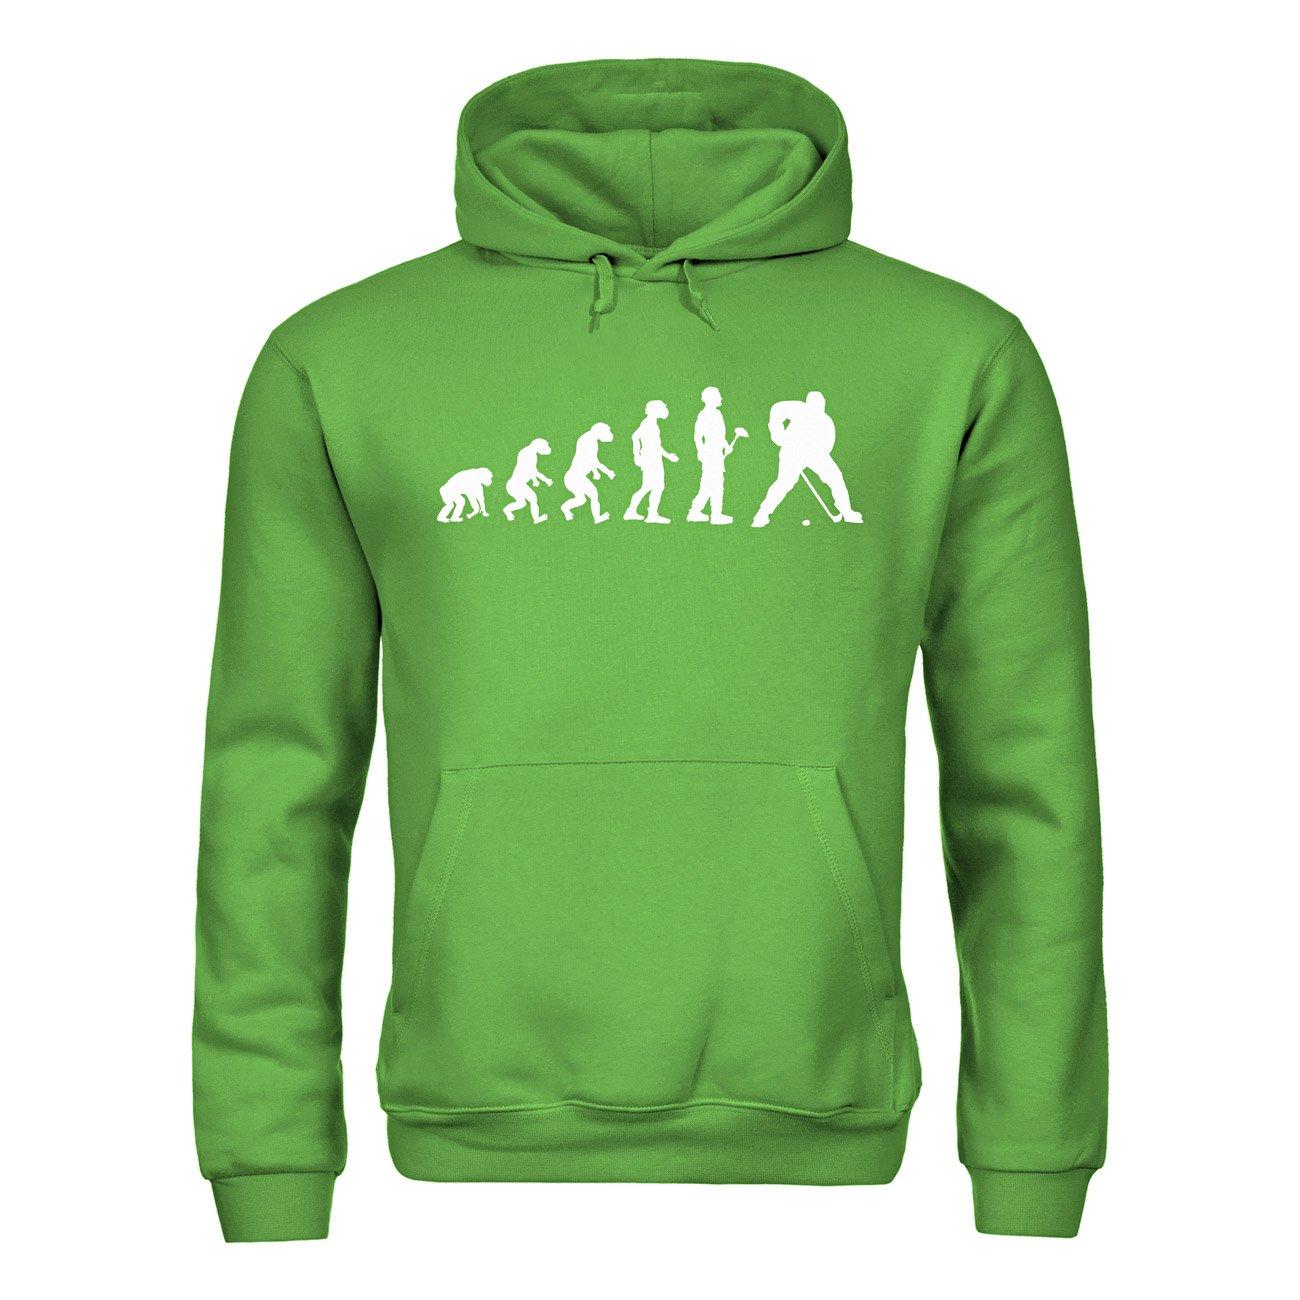 MDMA Kinder Kapuzensweatshirt Evolutionstheorie Eishockey mdma-kh00369